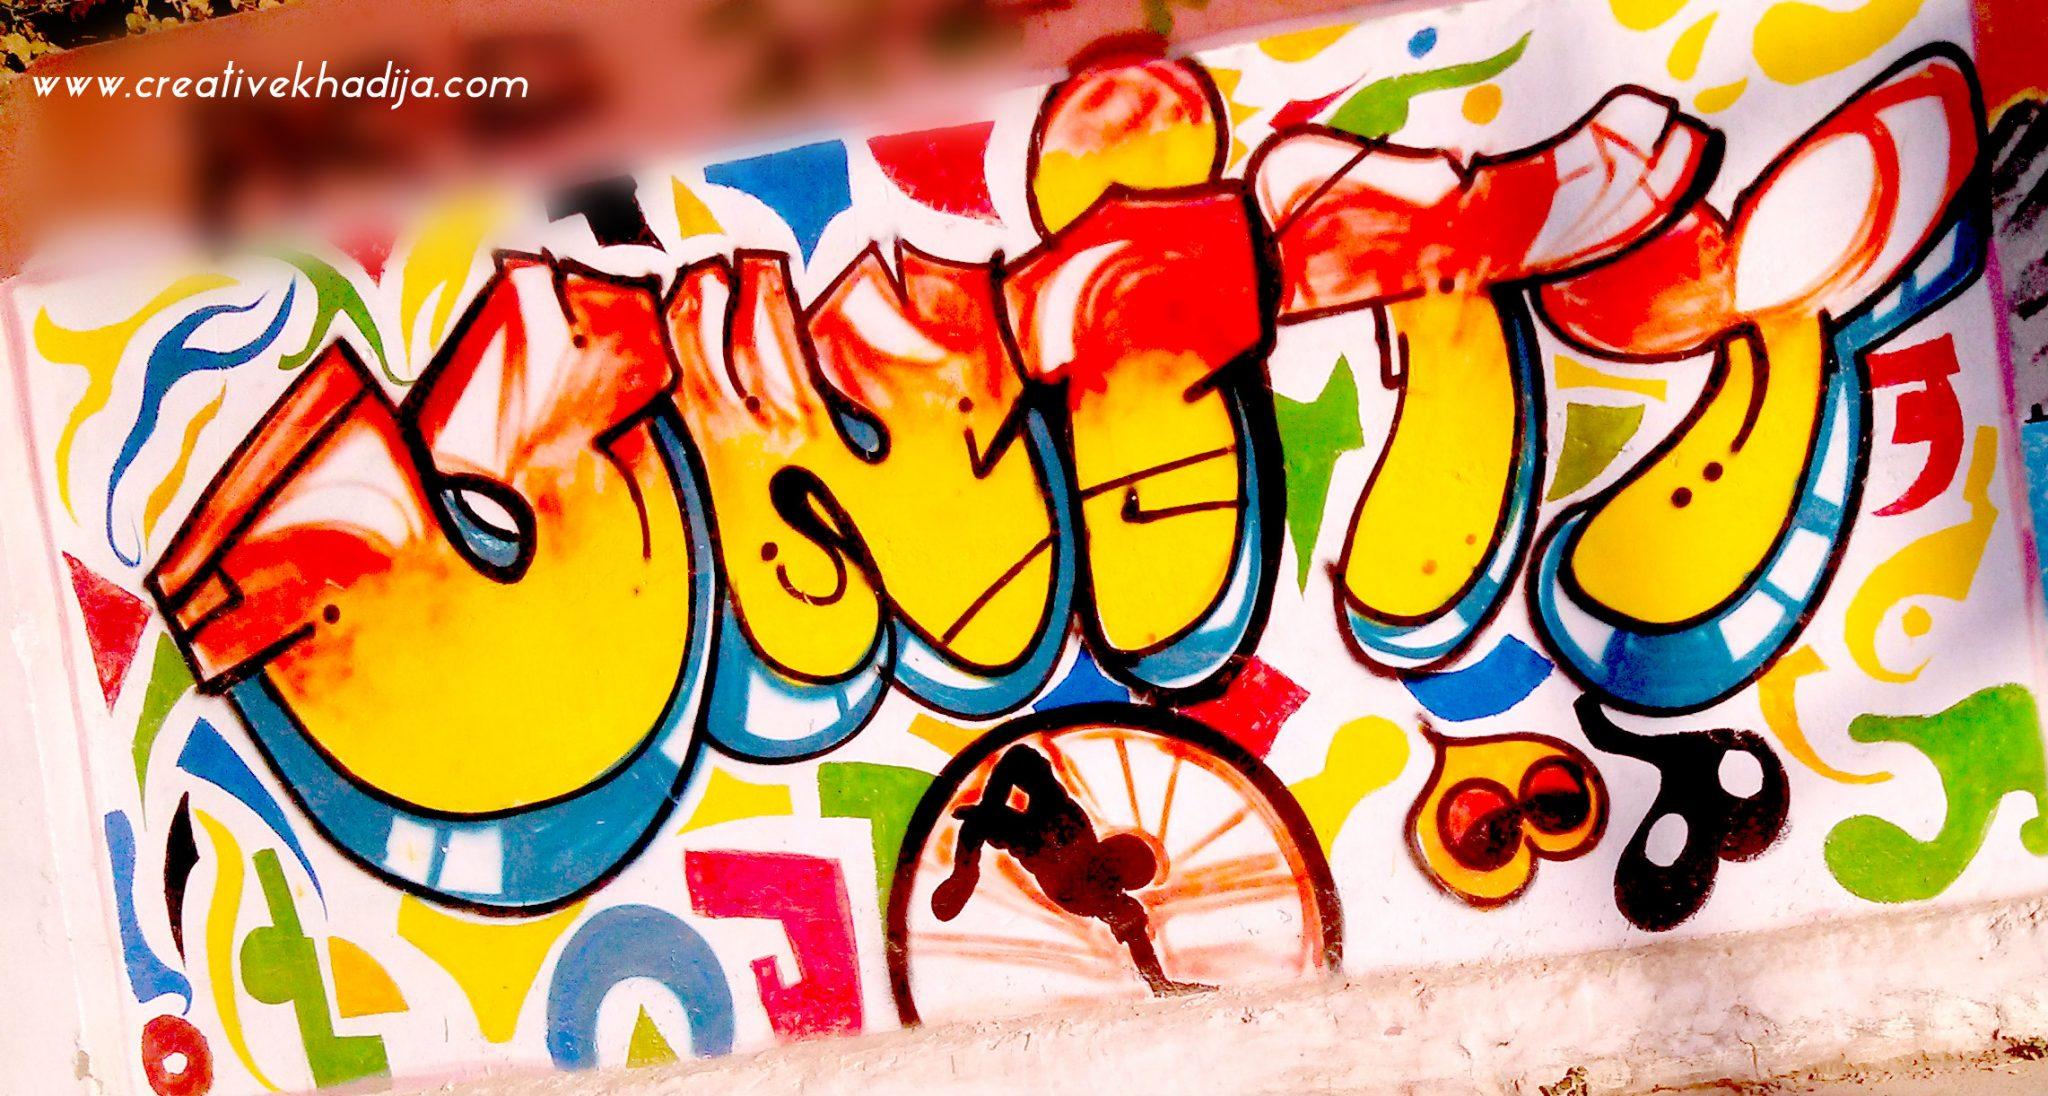 Graffiti wall painting - Download